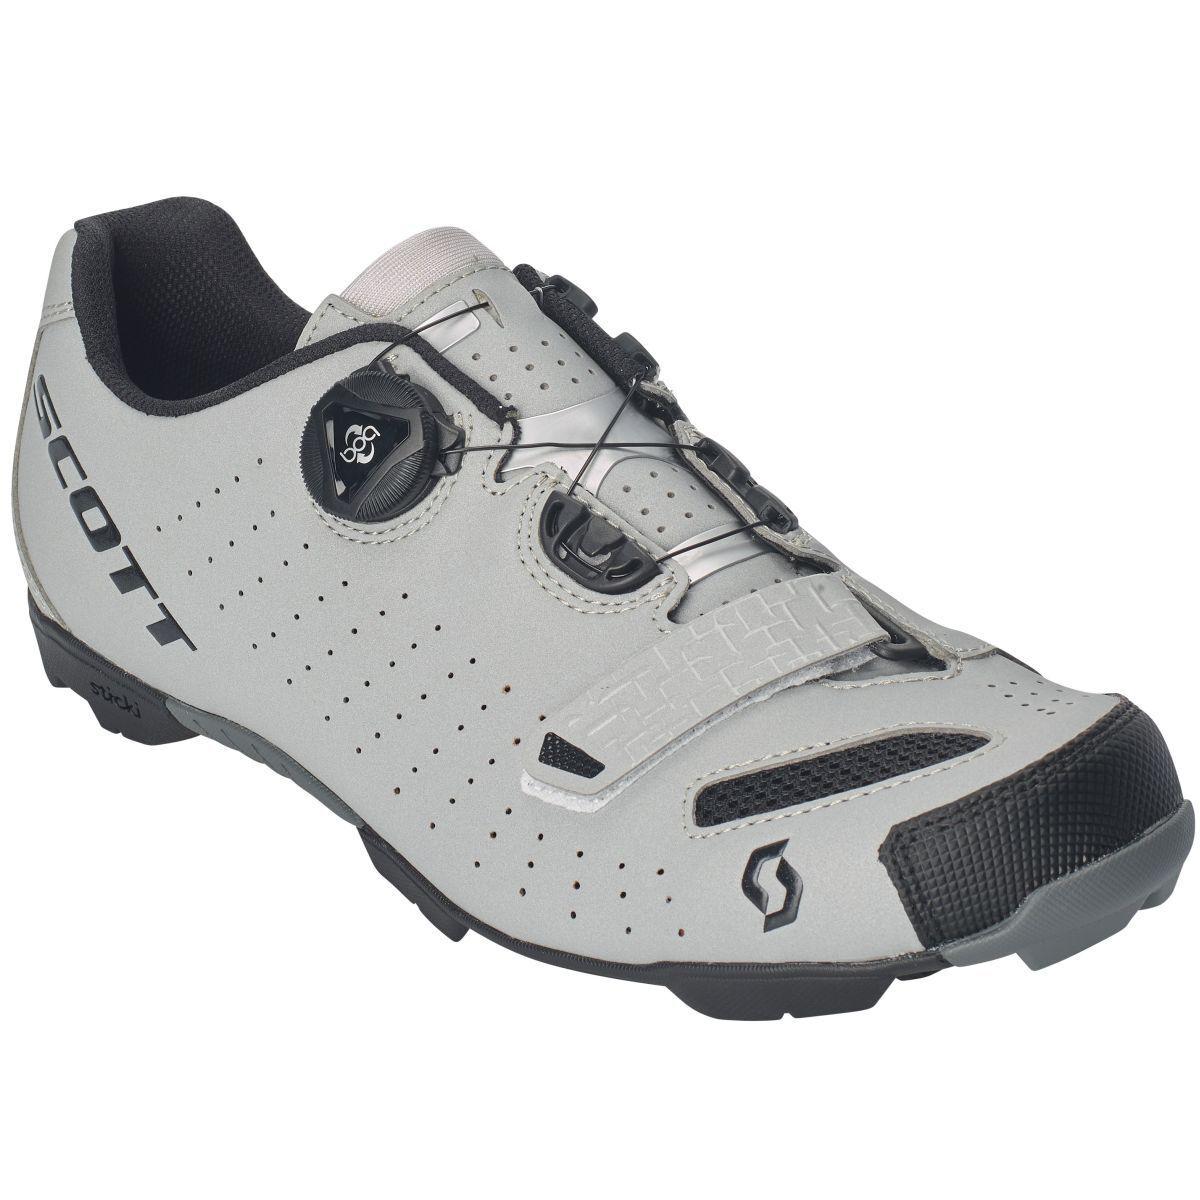 Bicicleta MTB Scott comp BOA mujer zapatos reflectante gris negro 2019